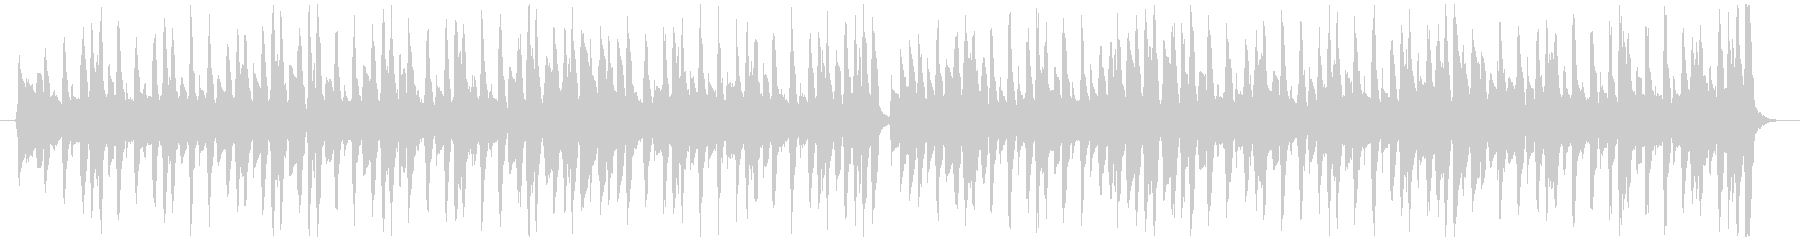 Guitarmonicaは、エレク...の未再生の波形